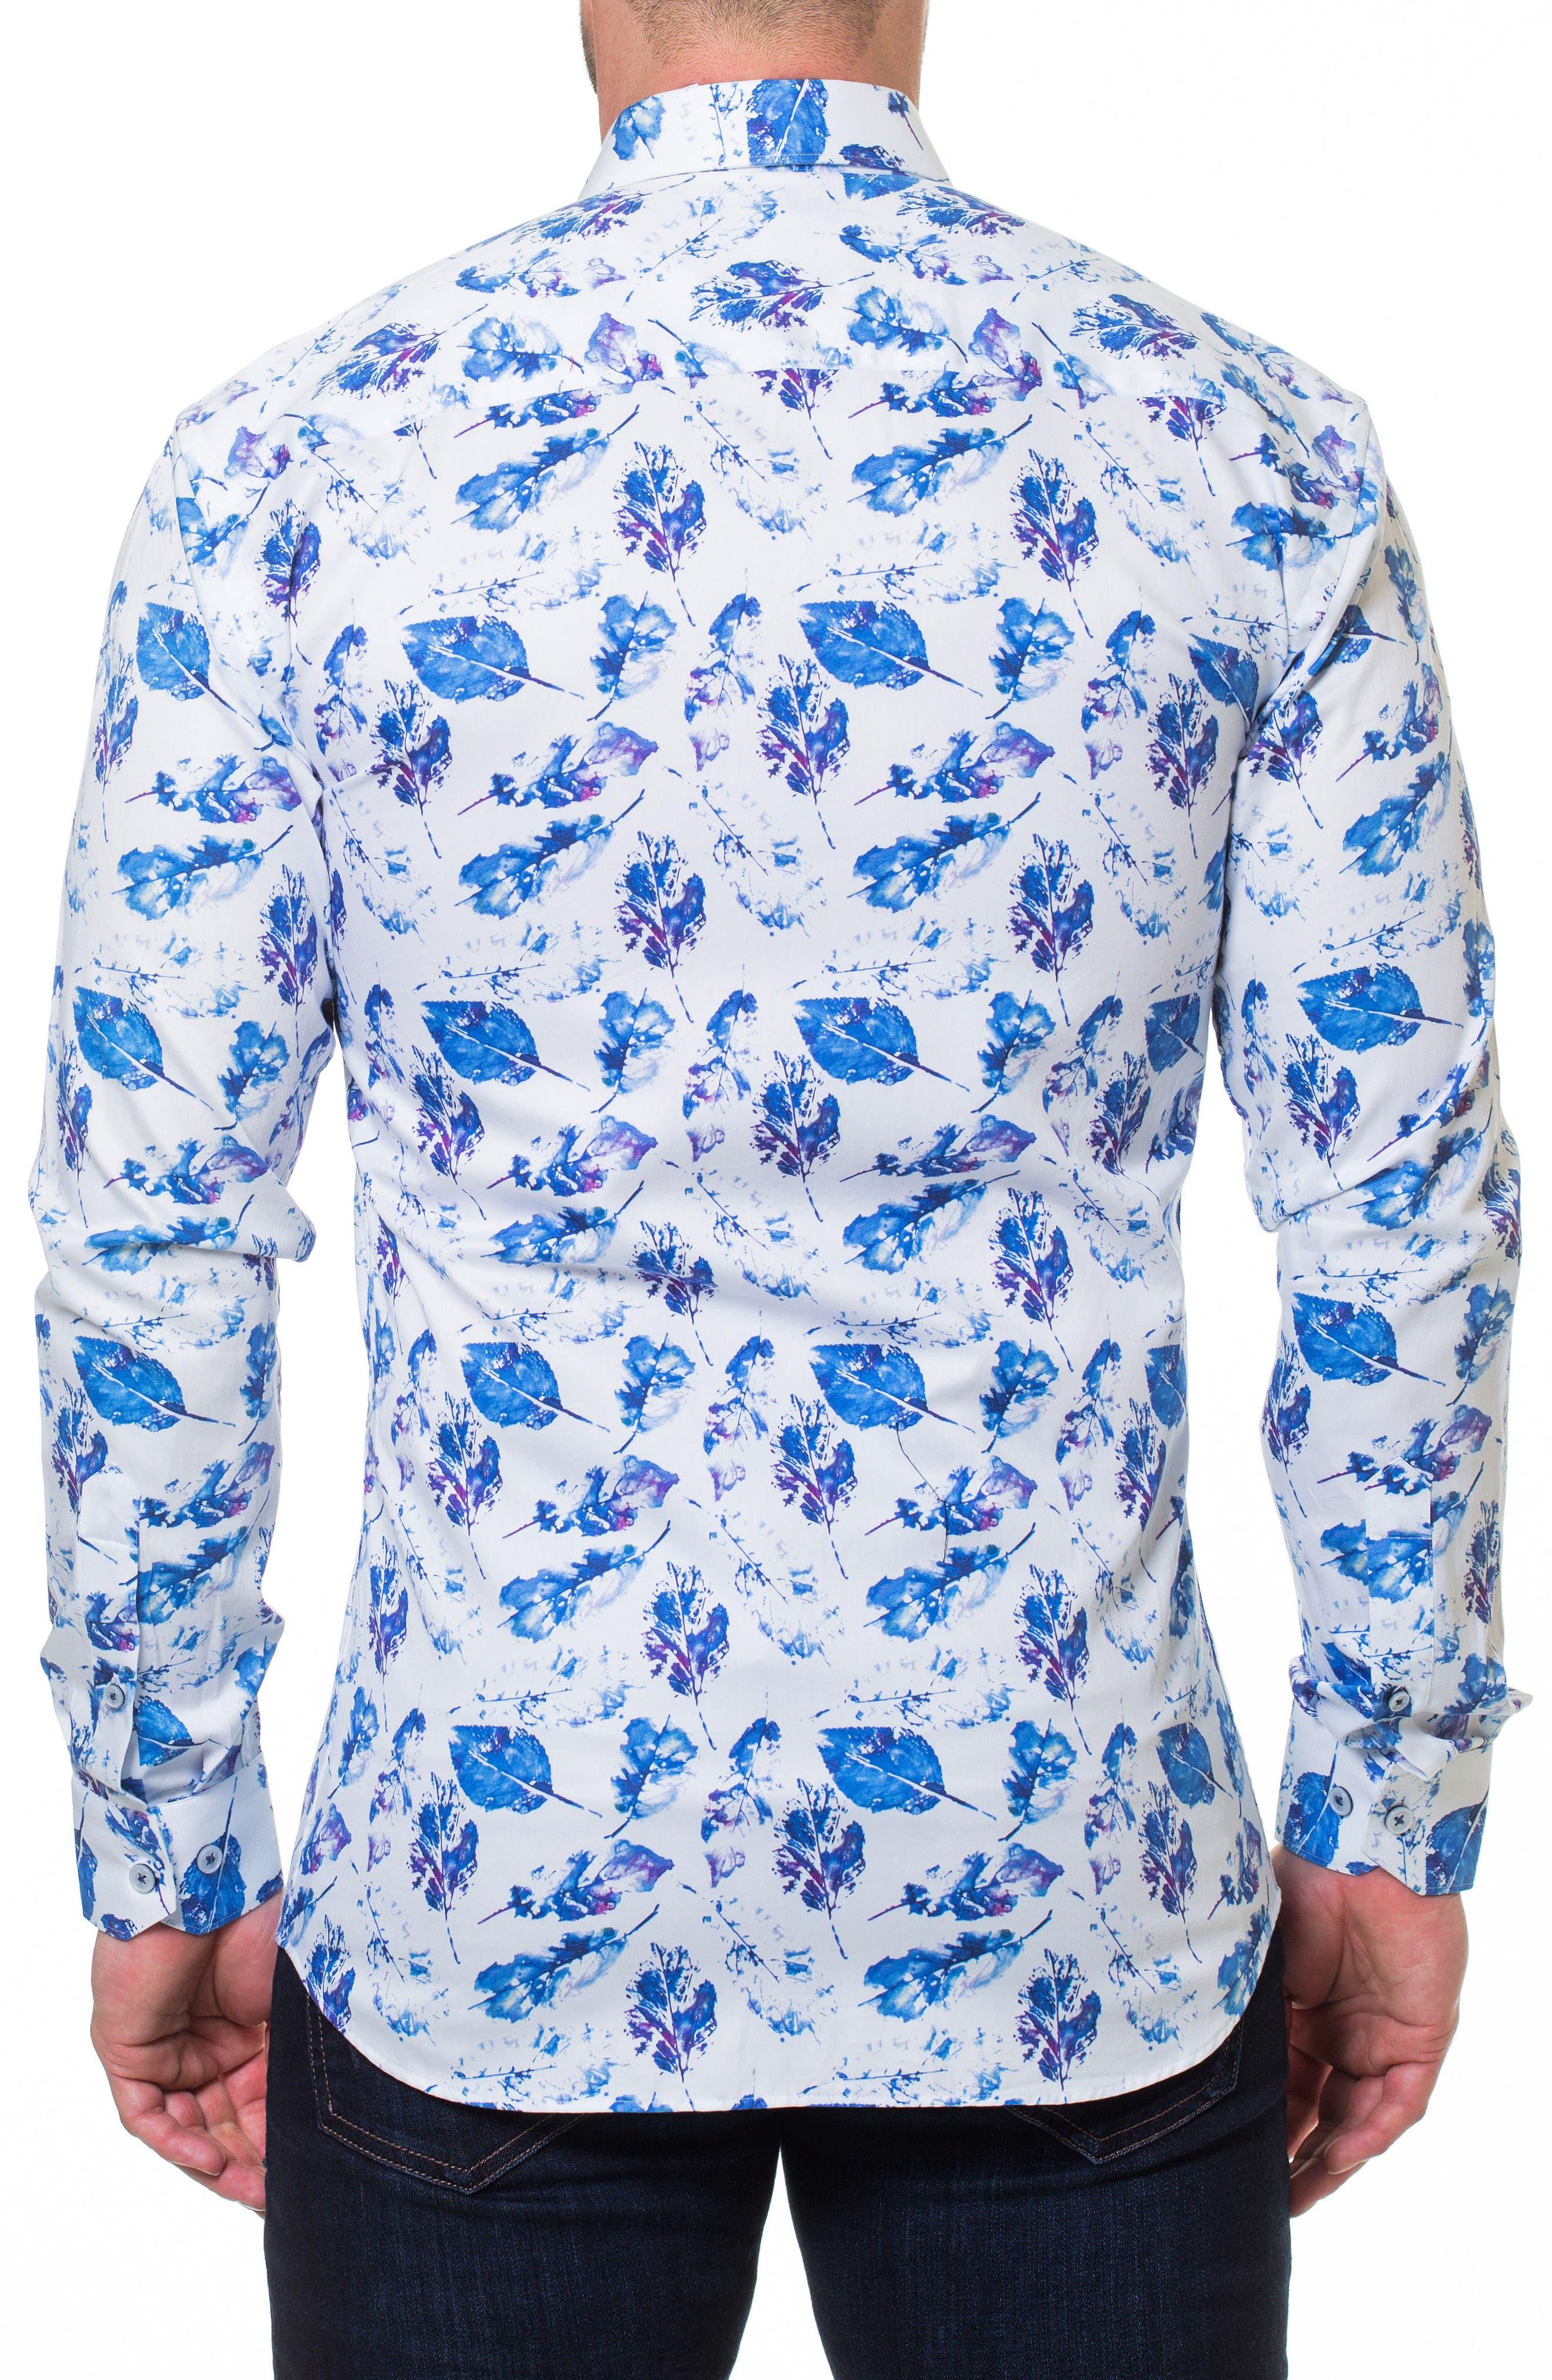 Luxor Peaceful Slim Fit Sport Shirt,                             Alternate thumbnail 2, color,                             WHITE